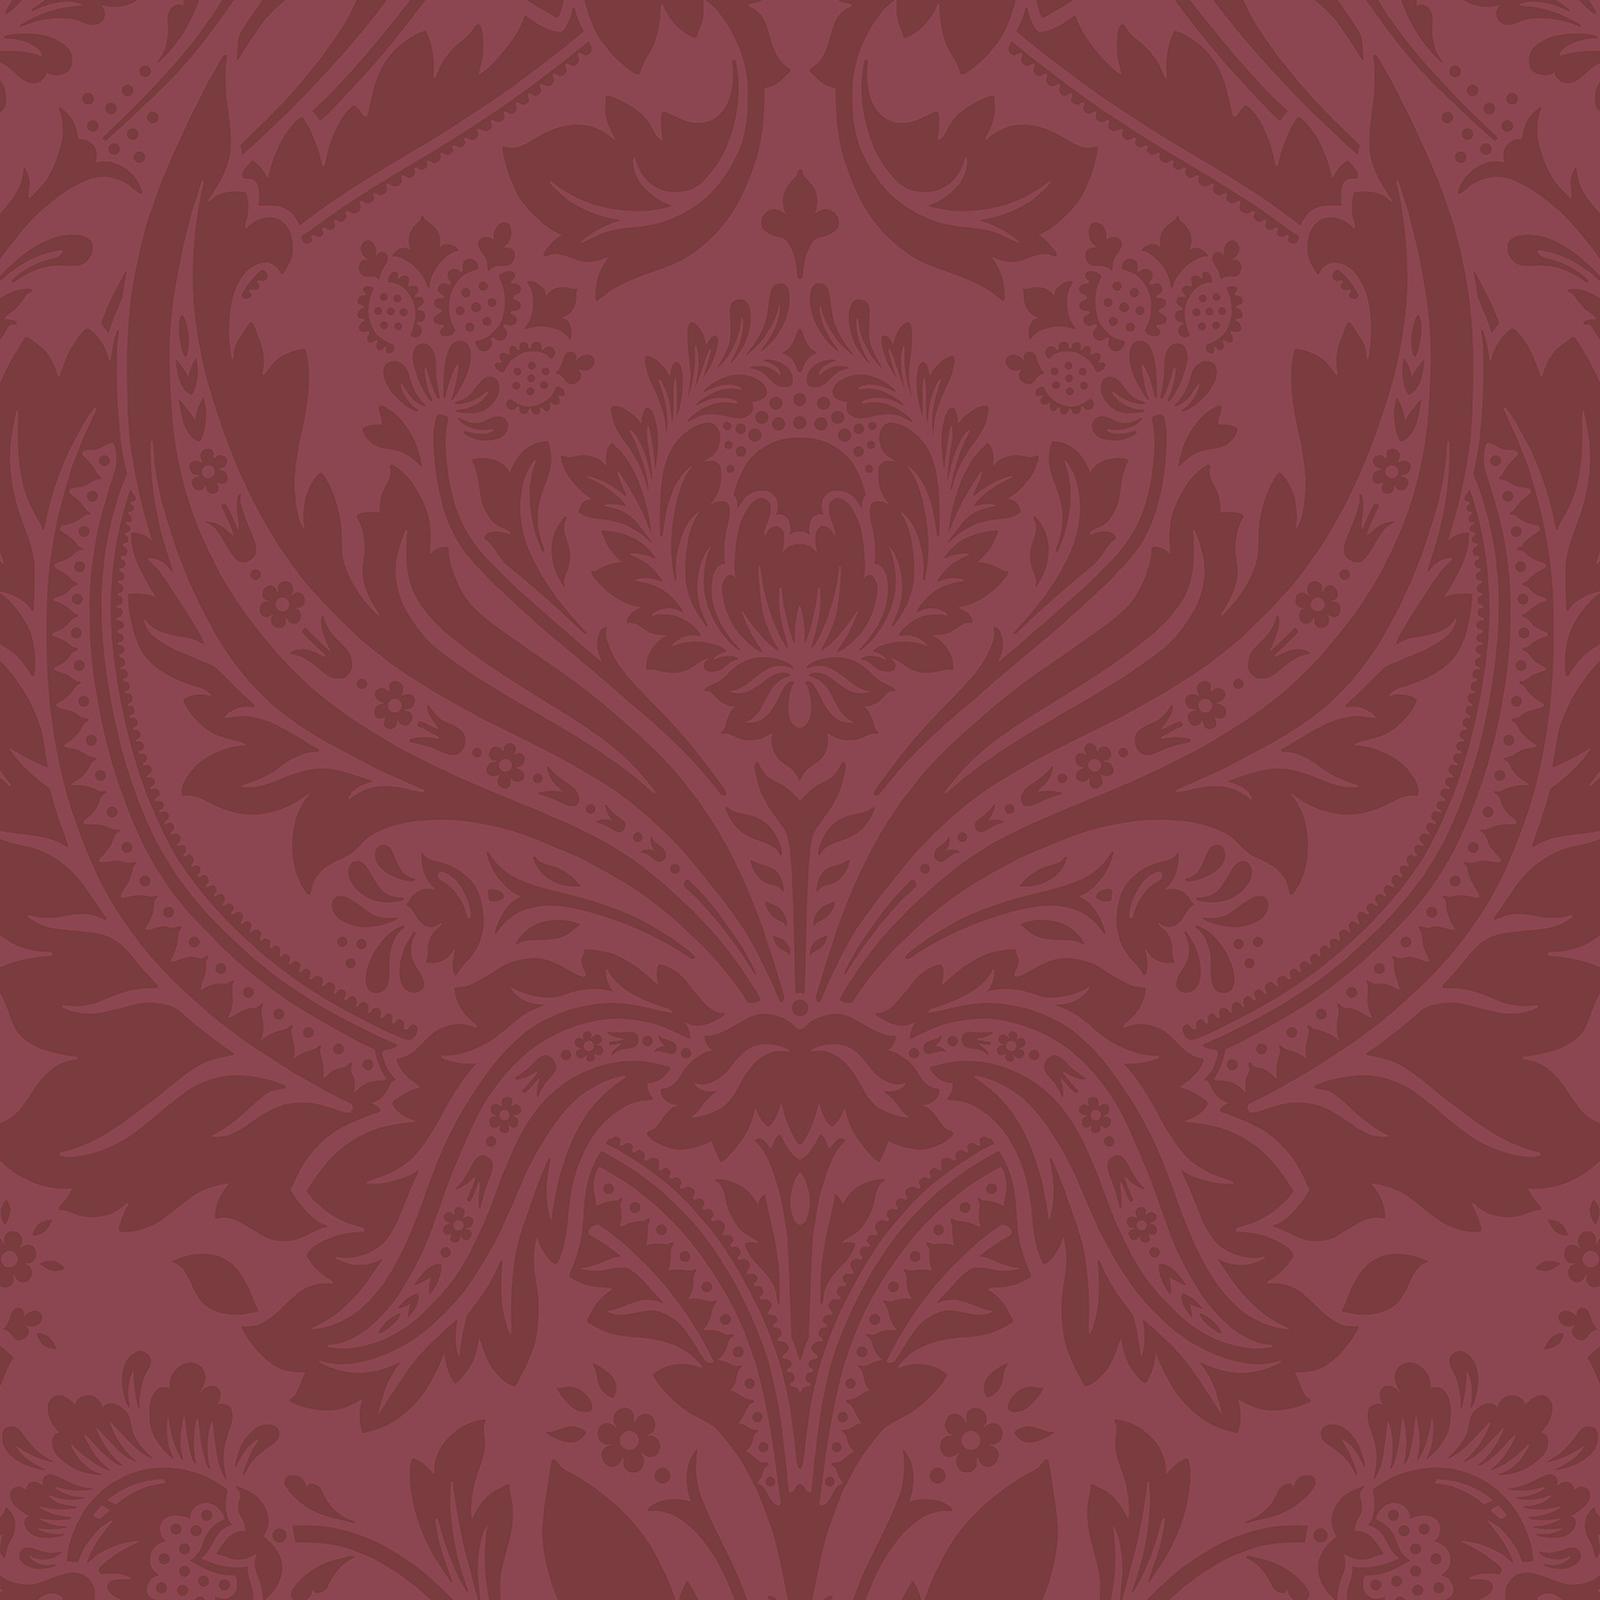 Designer G&B 52cm x 10m Red Desire Wallpaper